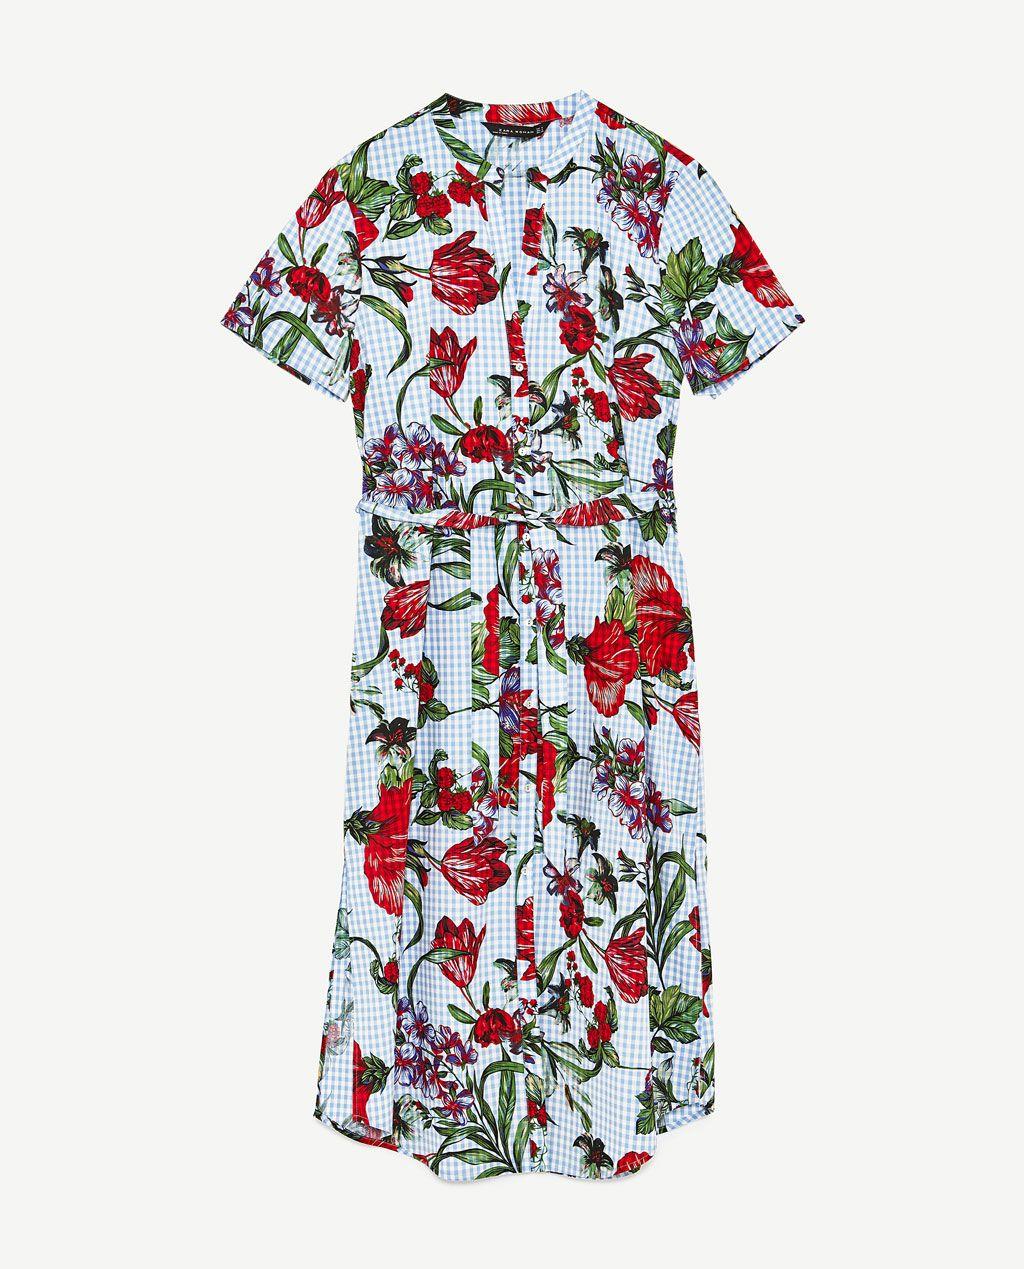 7e22c6a9210 FLORAL PRINT GINGHAM TUNIC, 100% cotton - Zara | Fashionspiration ...